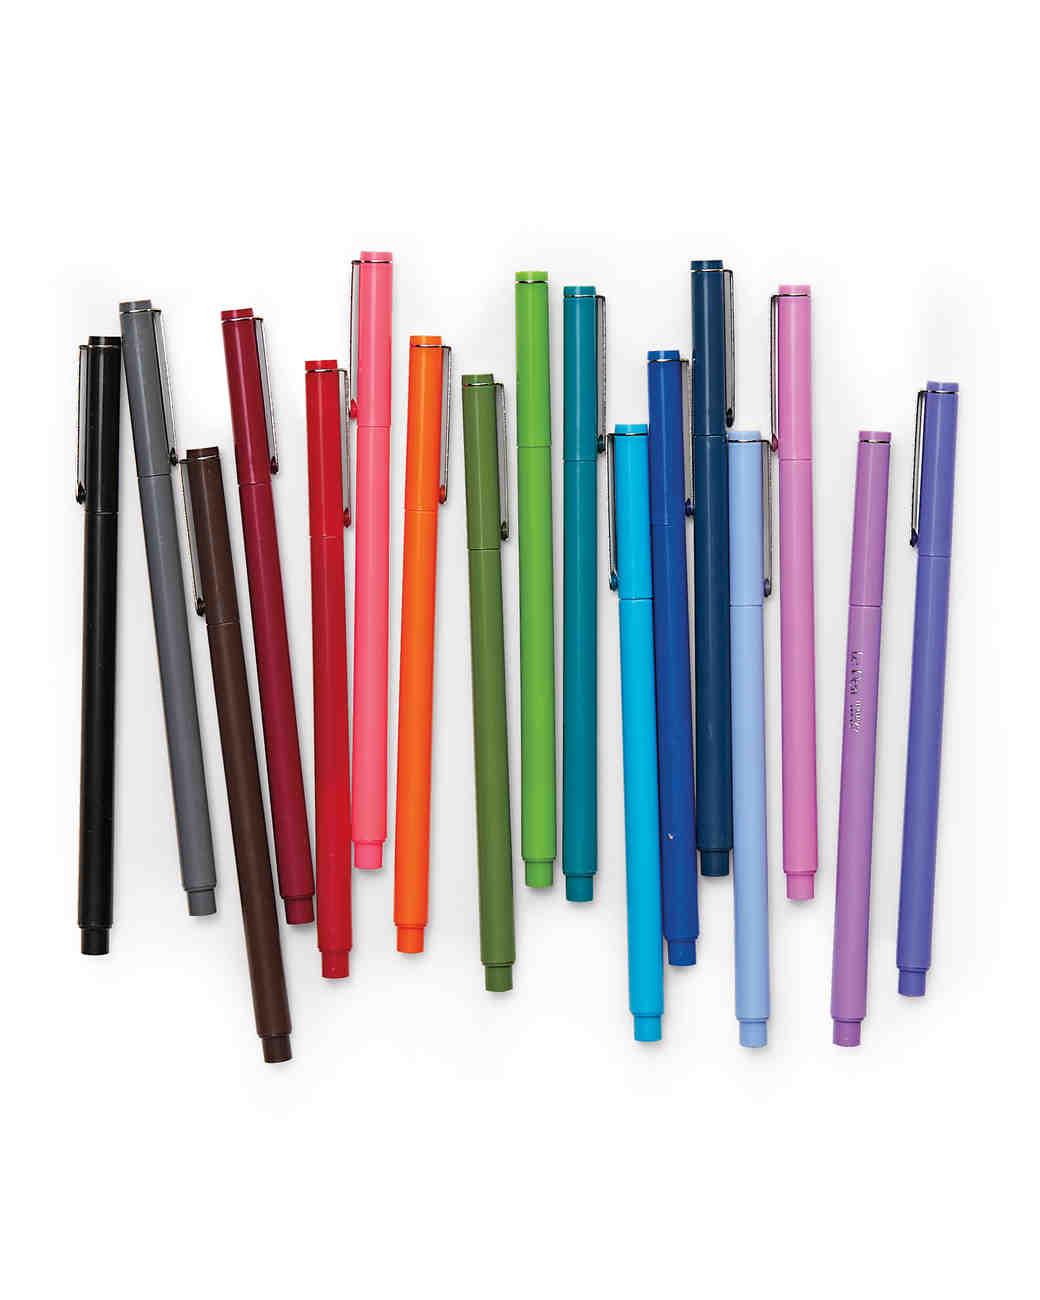 pens-003-mwd109642.jpg